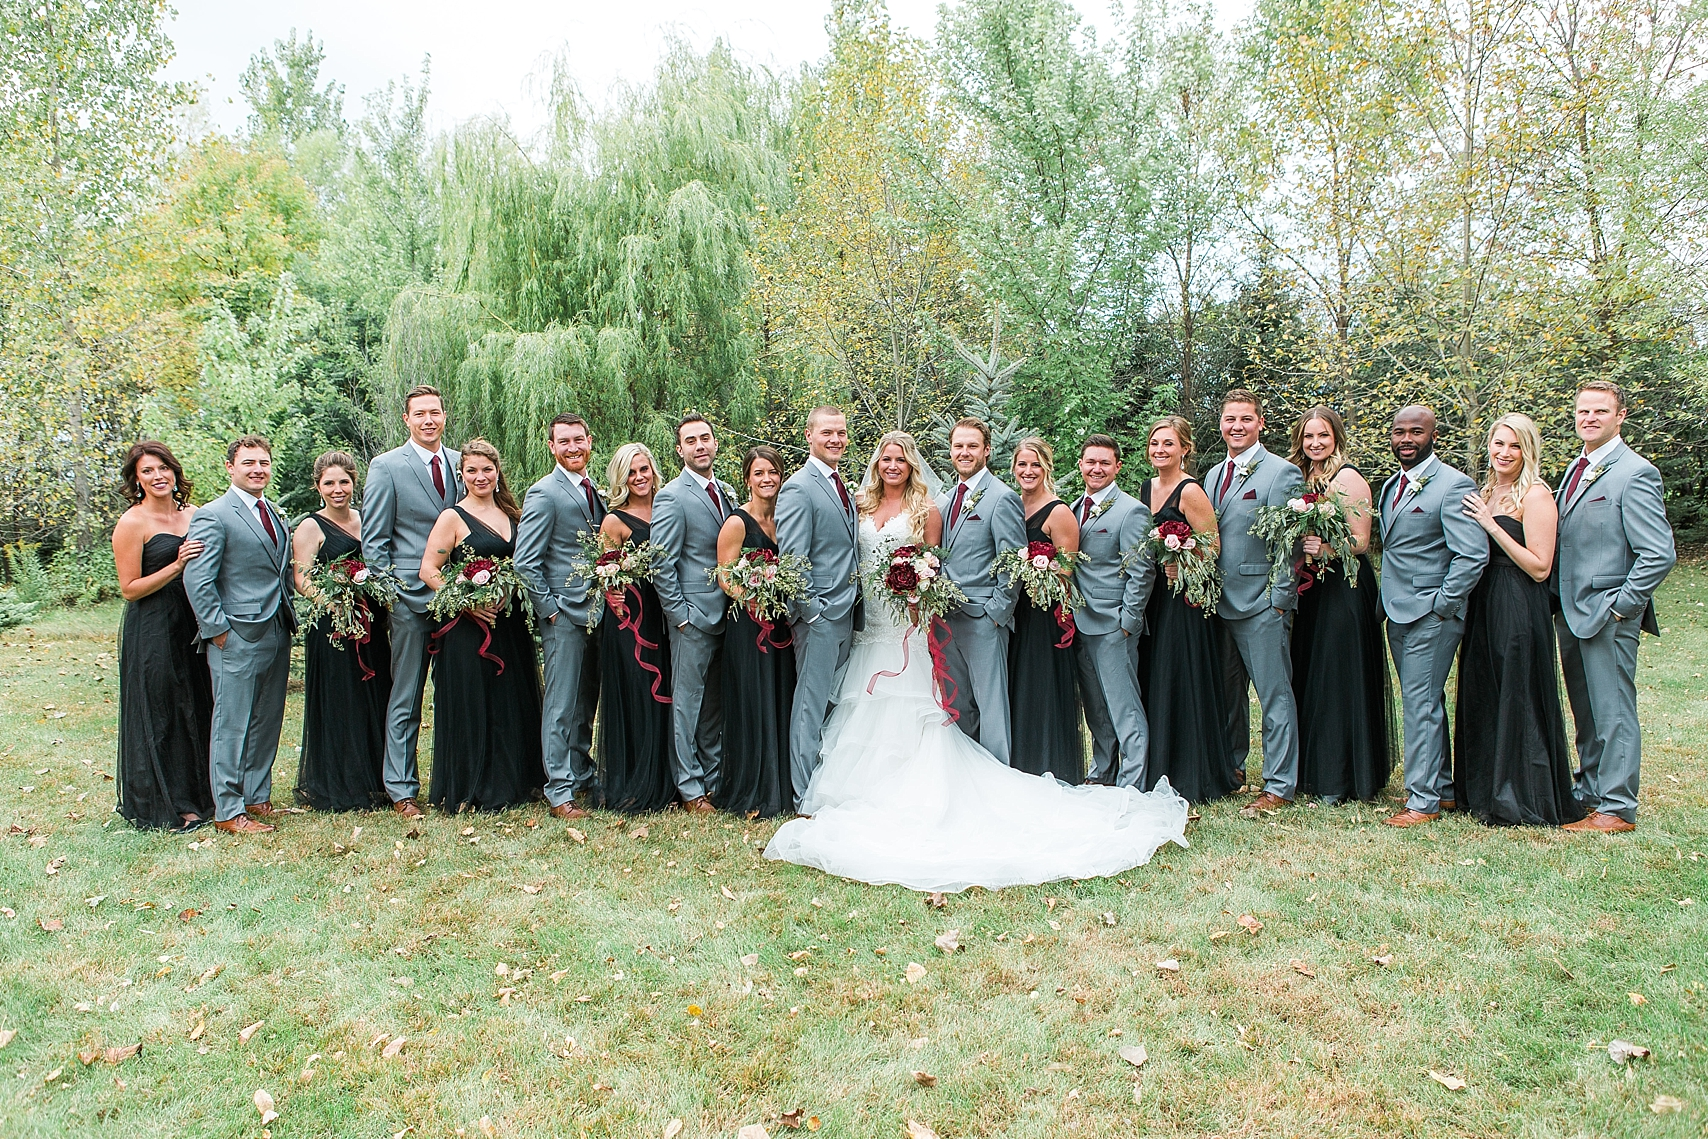 Minnesota Minneapolis Wedding Photographer Best Of 2018 Weddings Mallory Kiesow Photography_0198.jpg